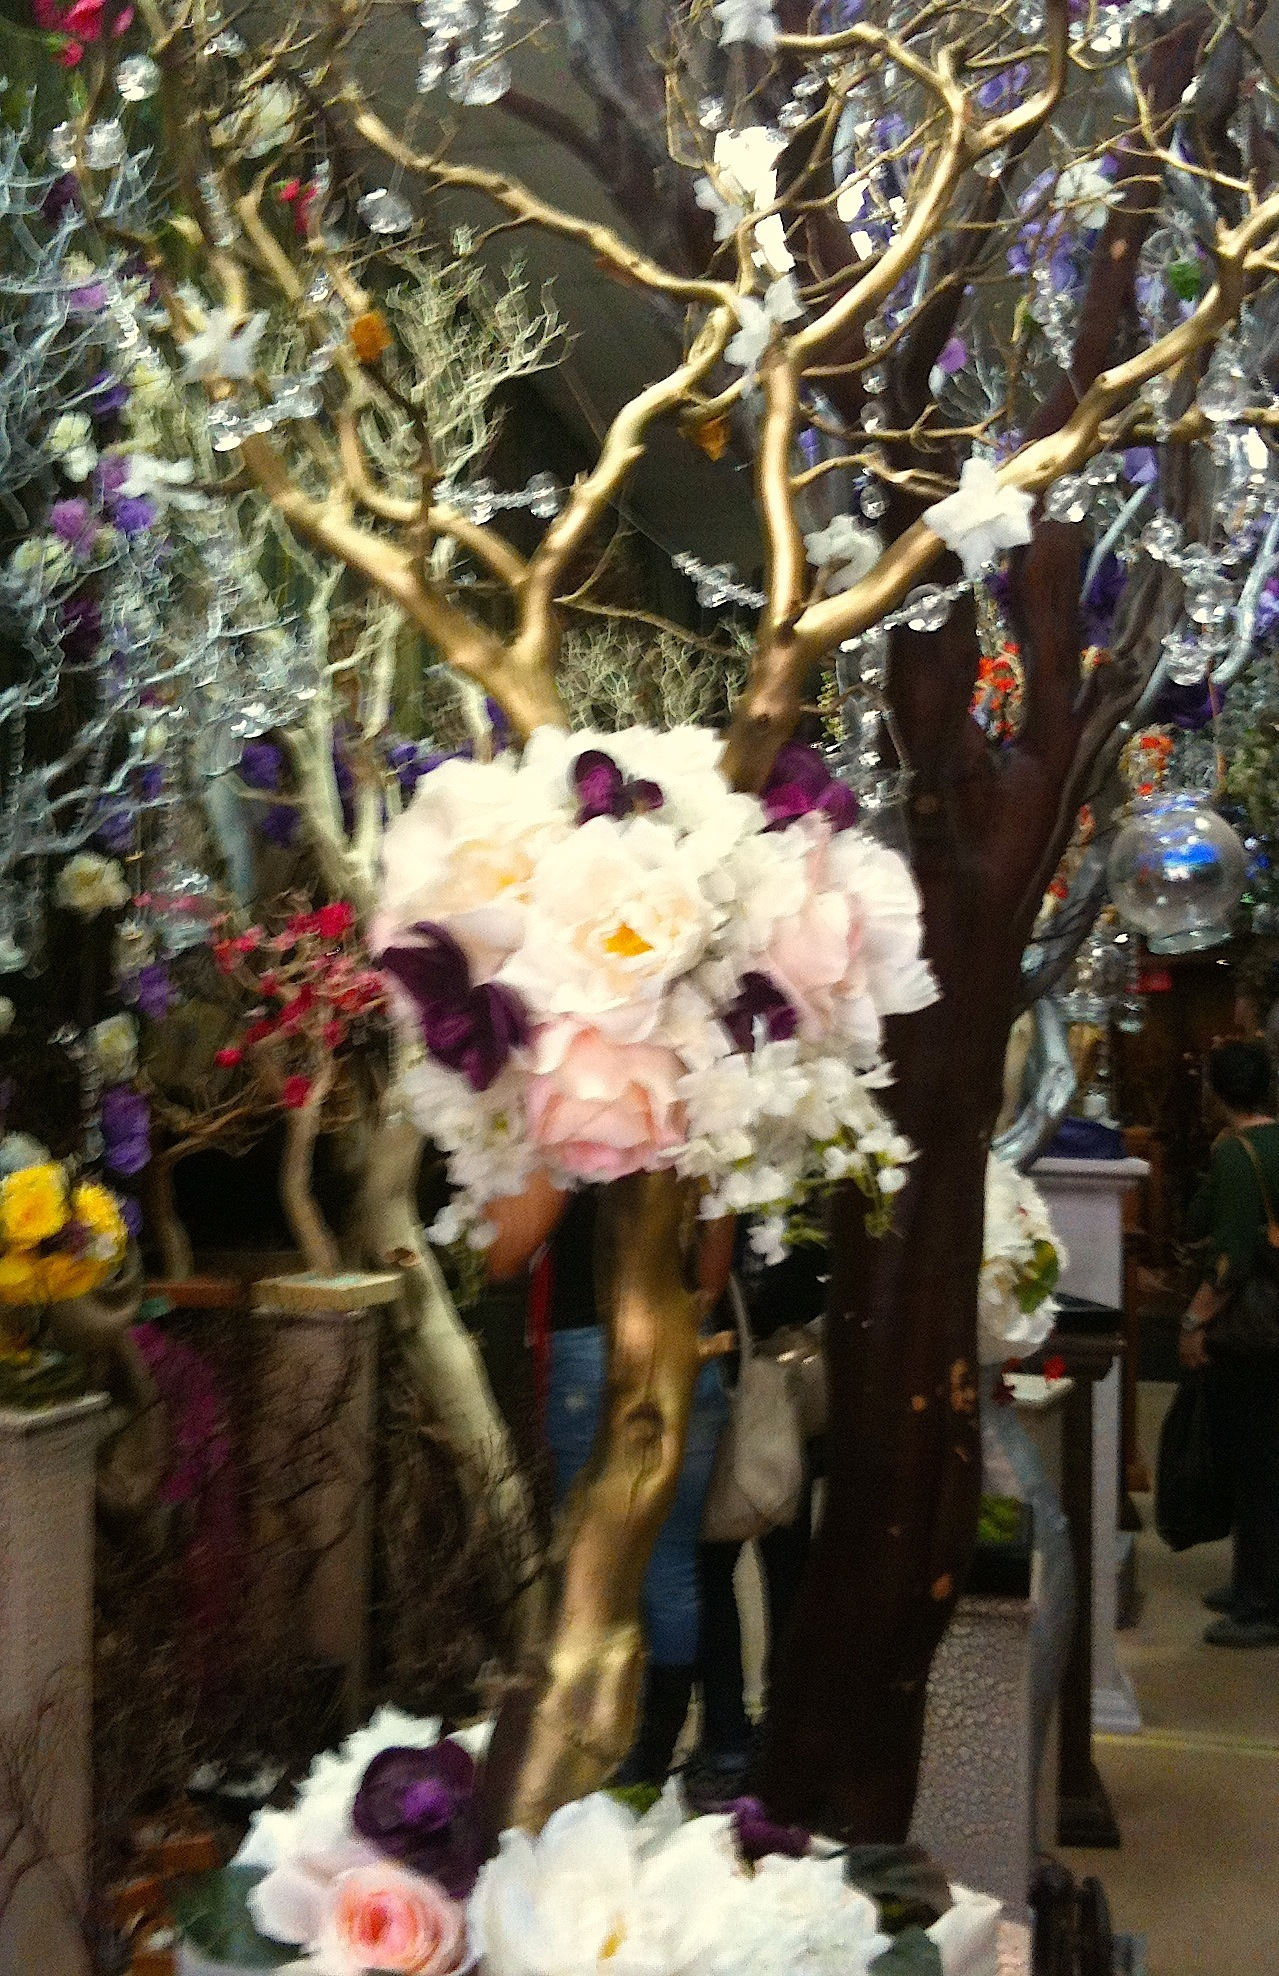 Reception, Flowers & Decor, Centerpieces, Centerpiece, Tree, Manzanita